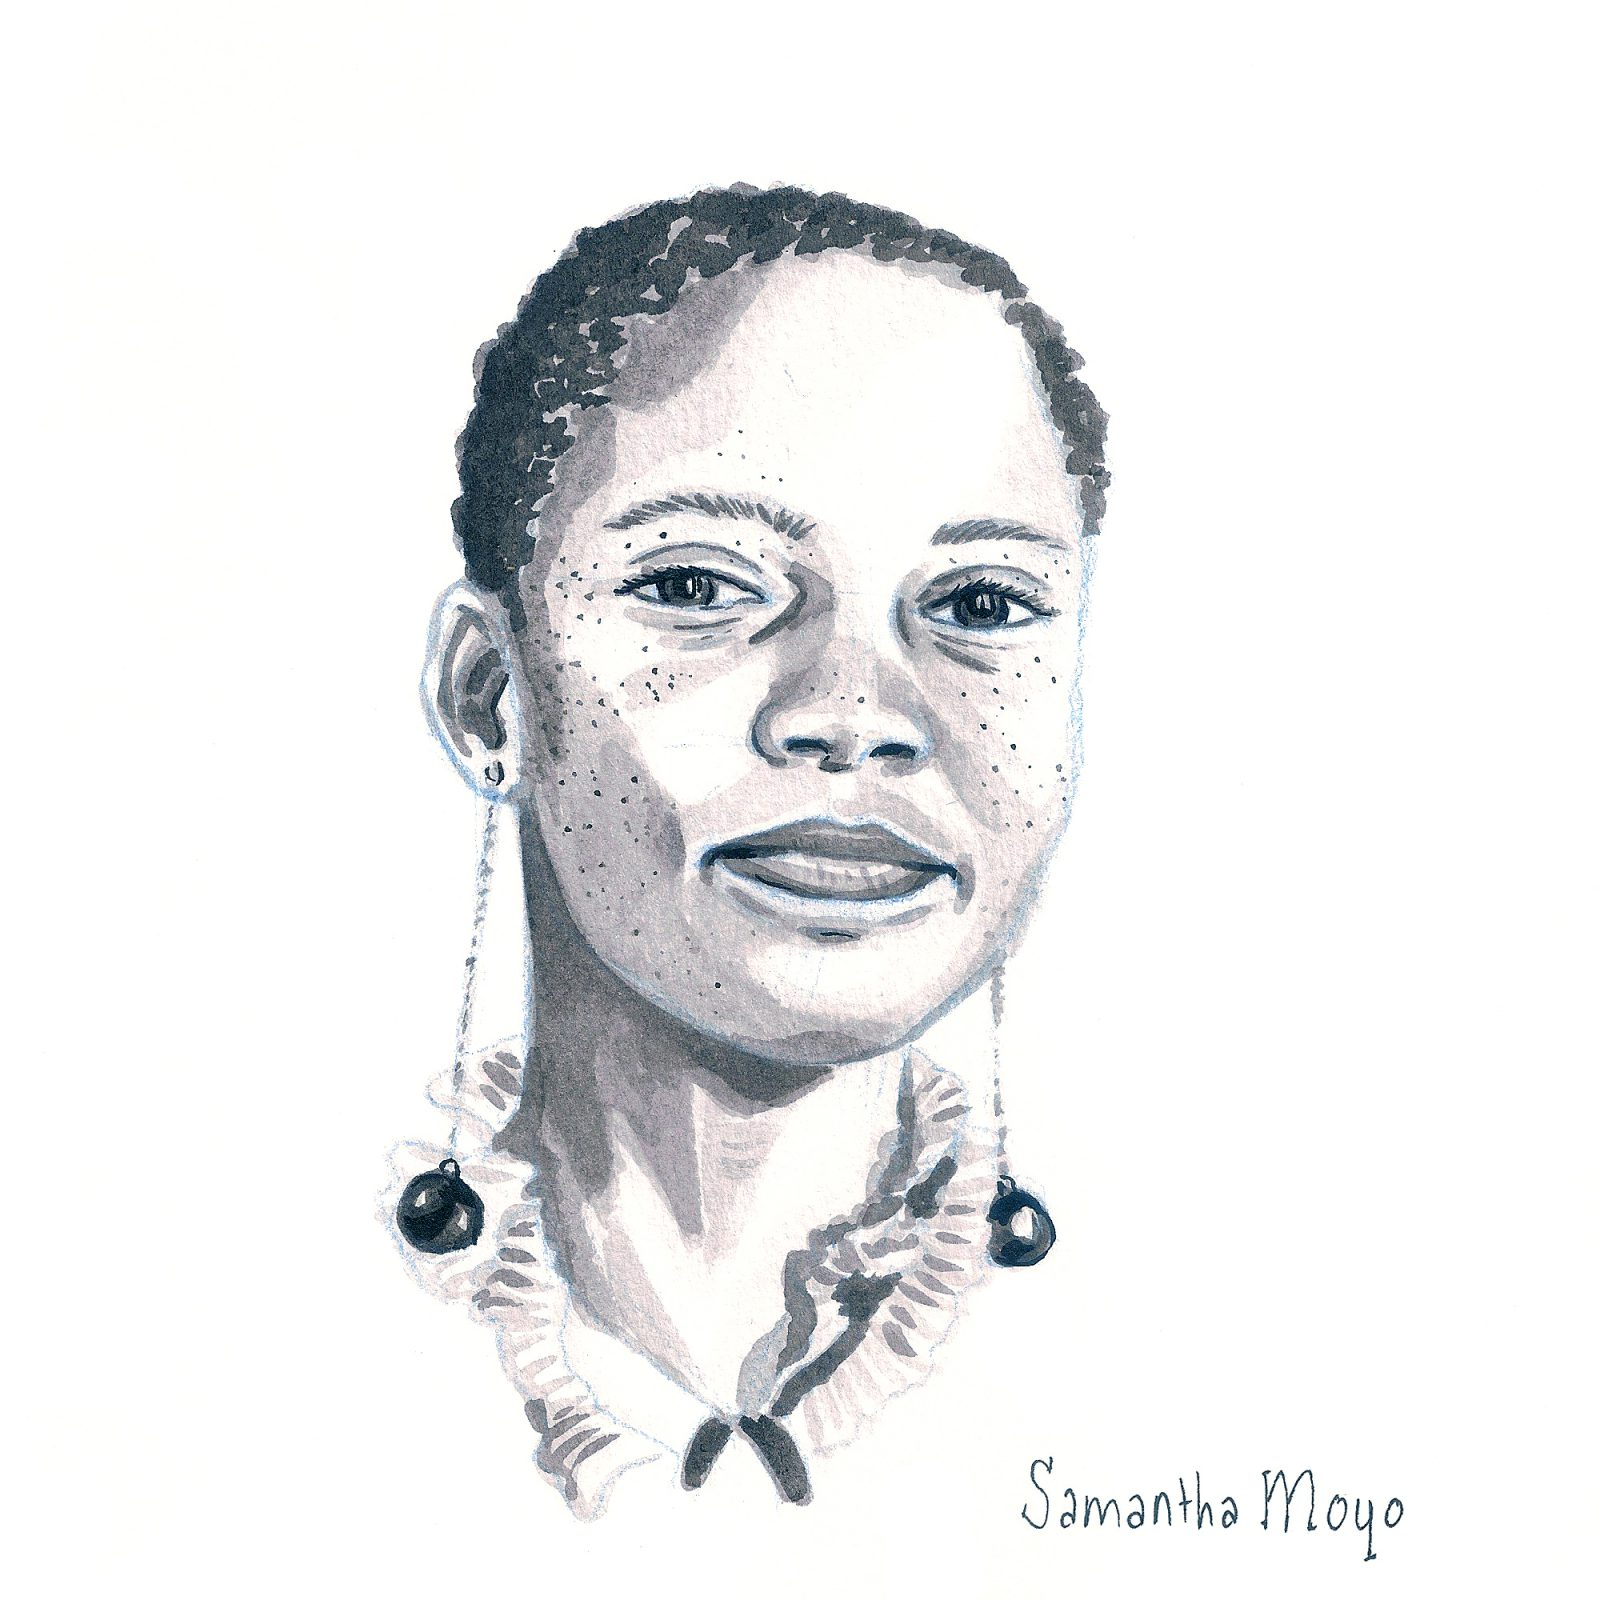 Samantha Moyo